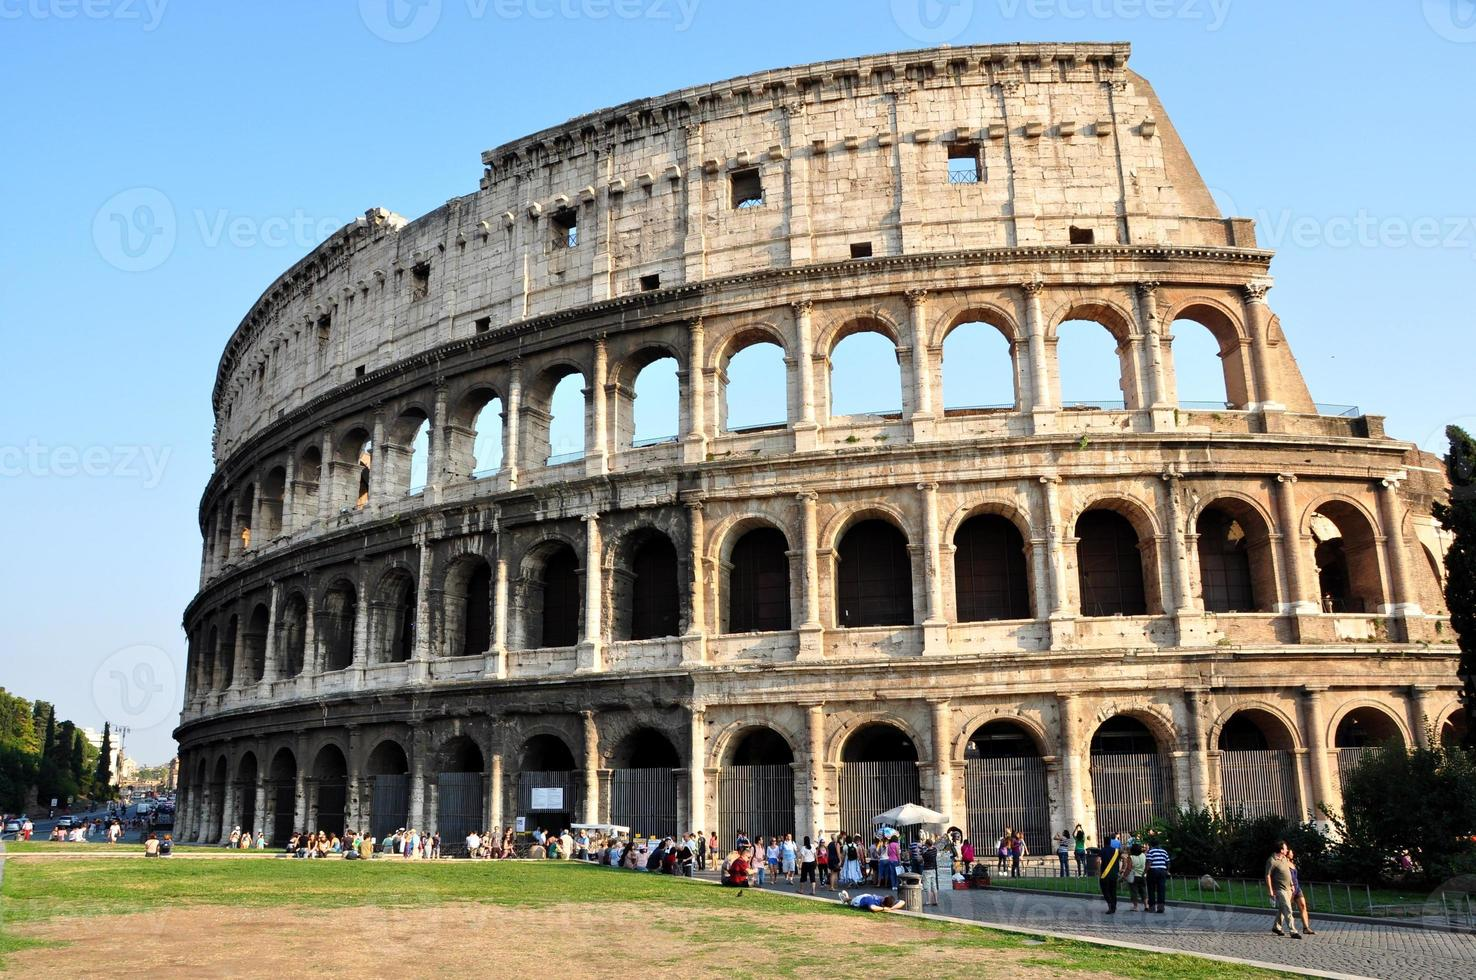 сolosseum romano foto